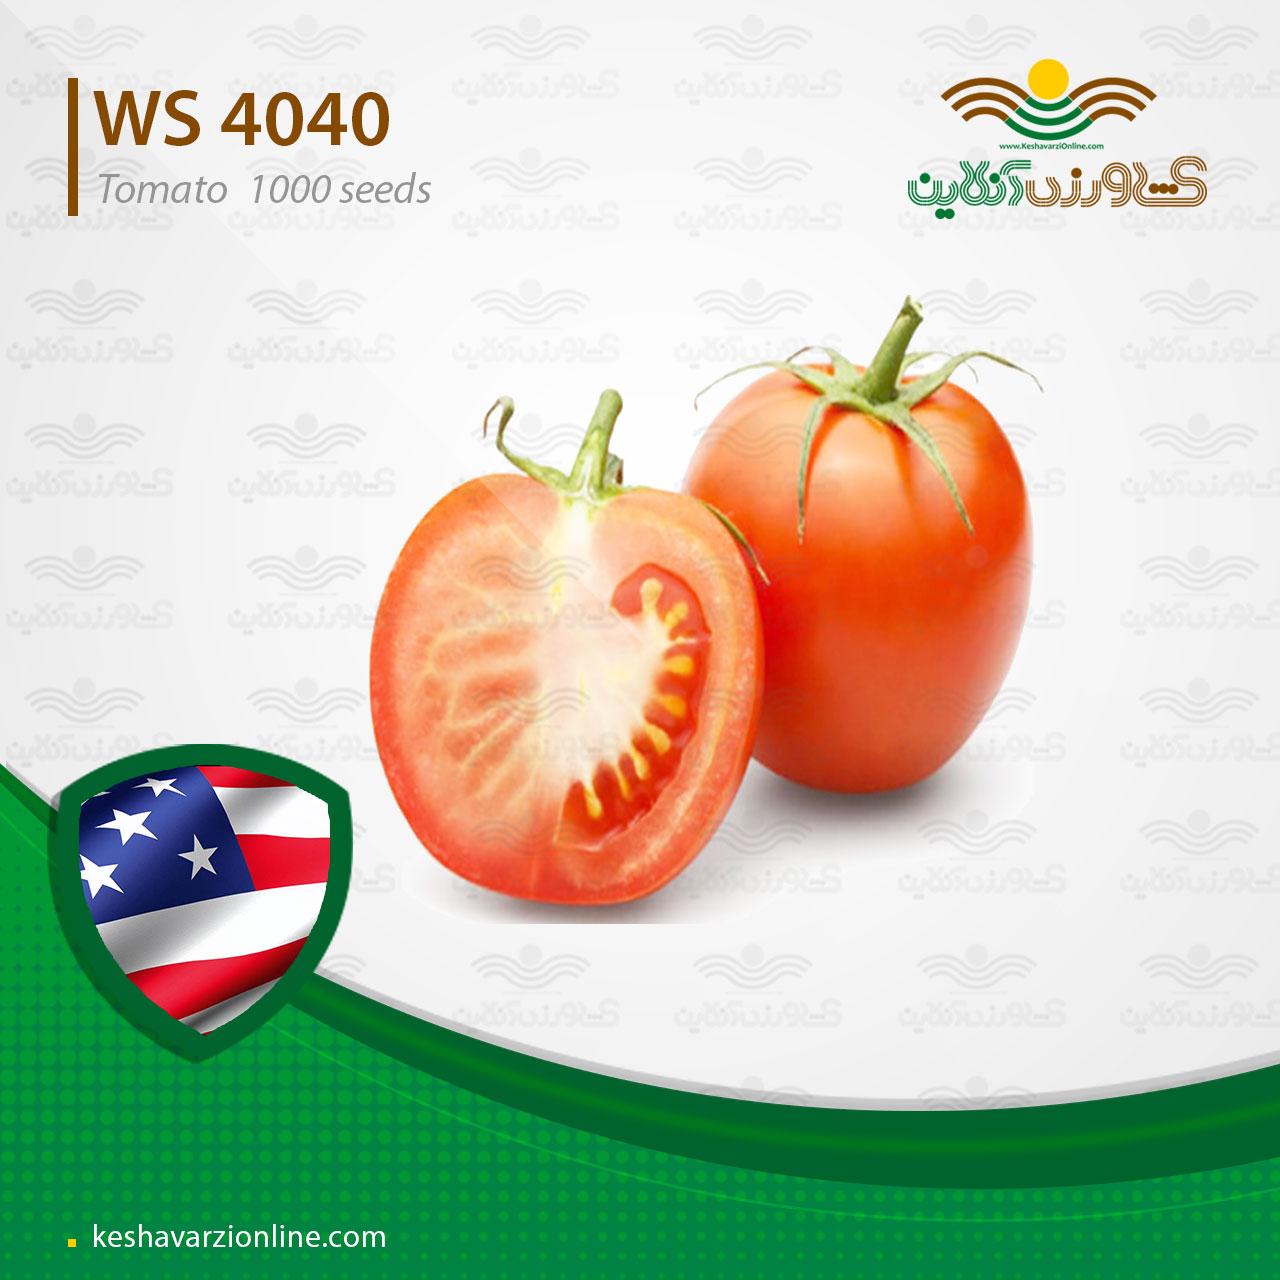 بذر گوجه فرنگی هیبرید دبلیواس 4040